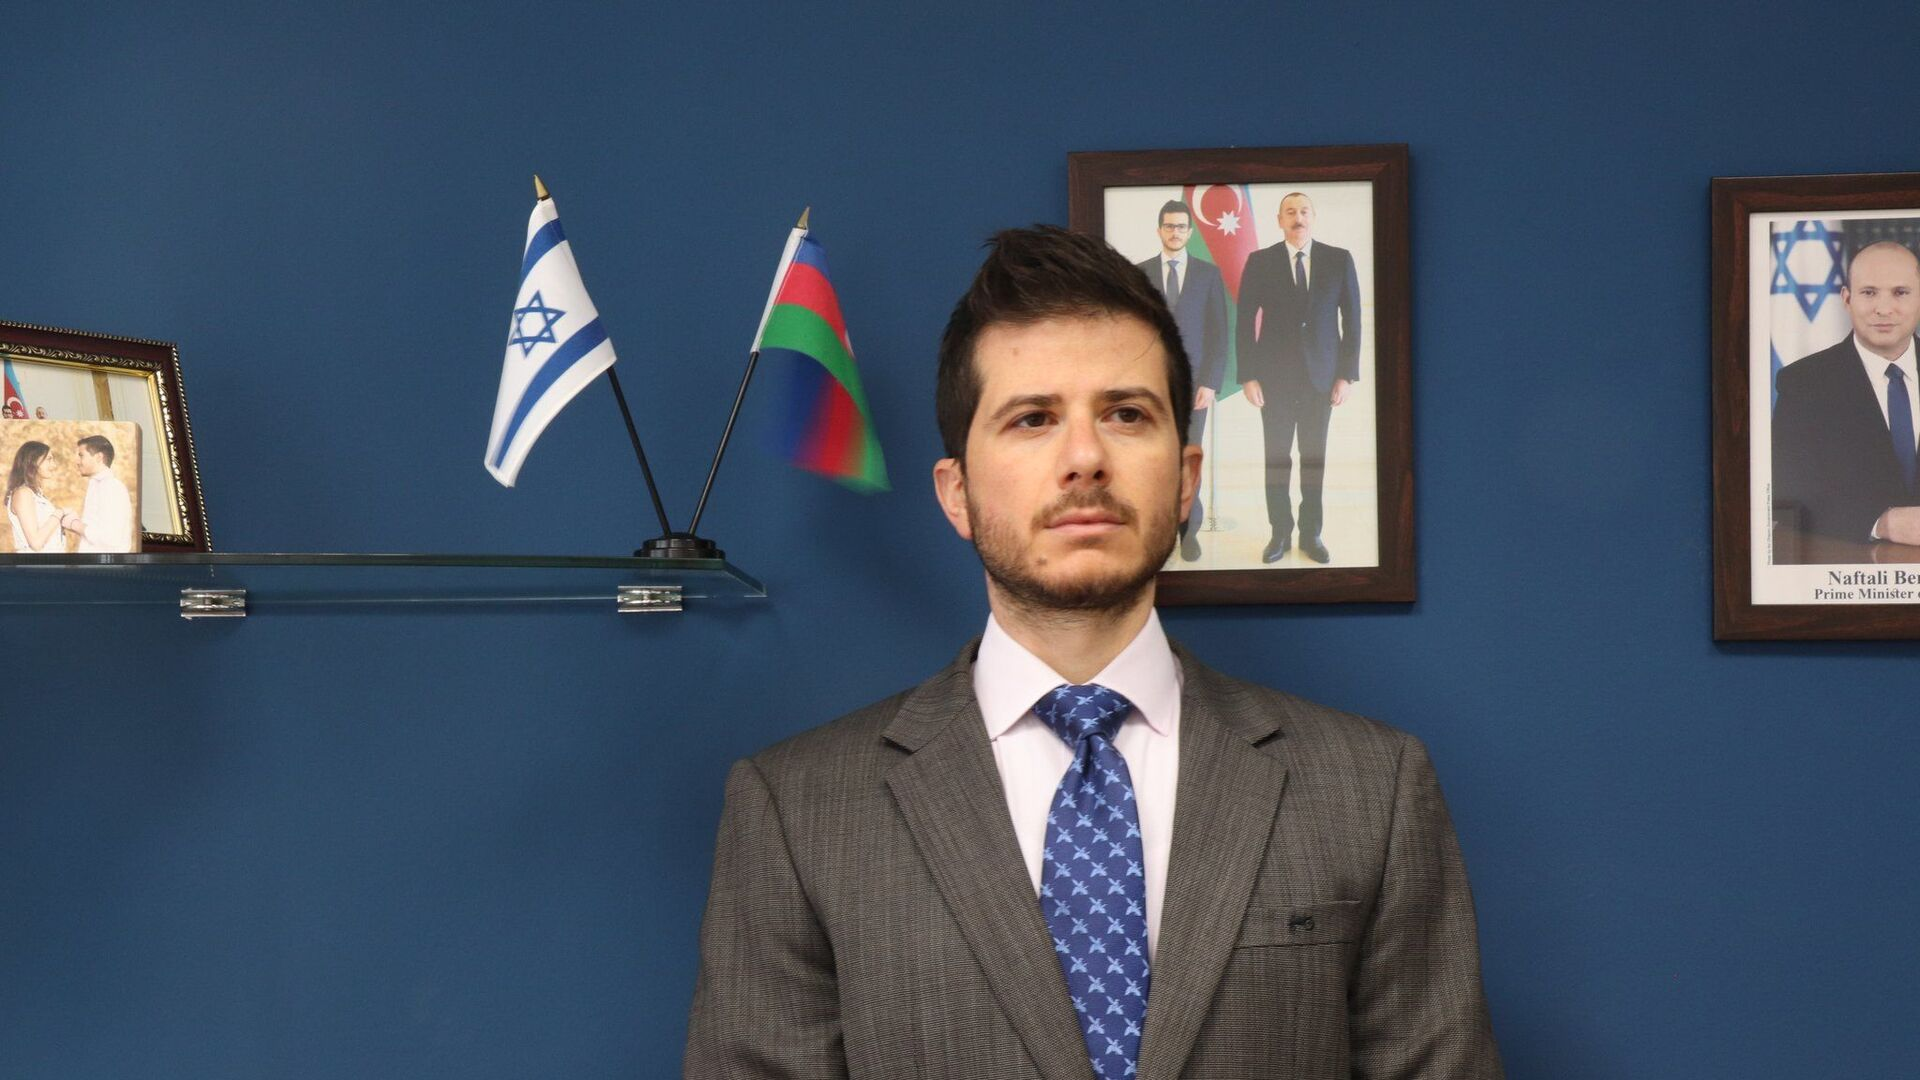 Посол Израиля в Азербайджане Джордж Дик  - Sputnik Азербайджан, 1920, 27.09.2021